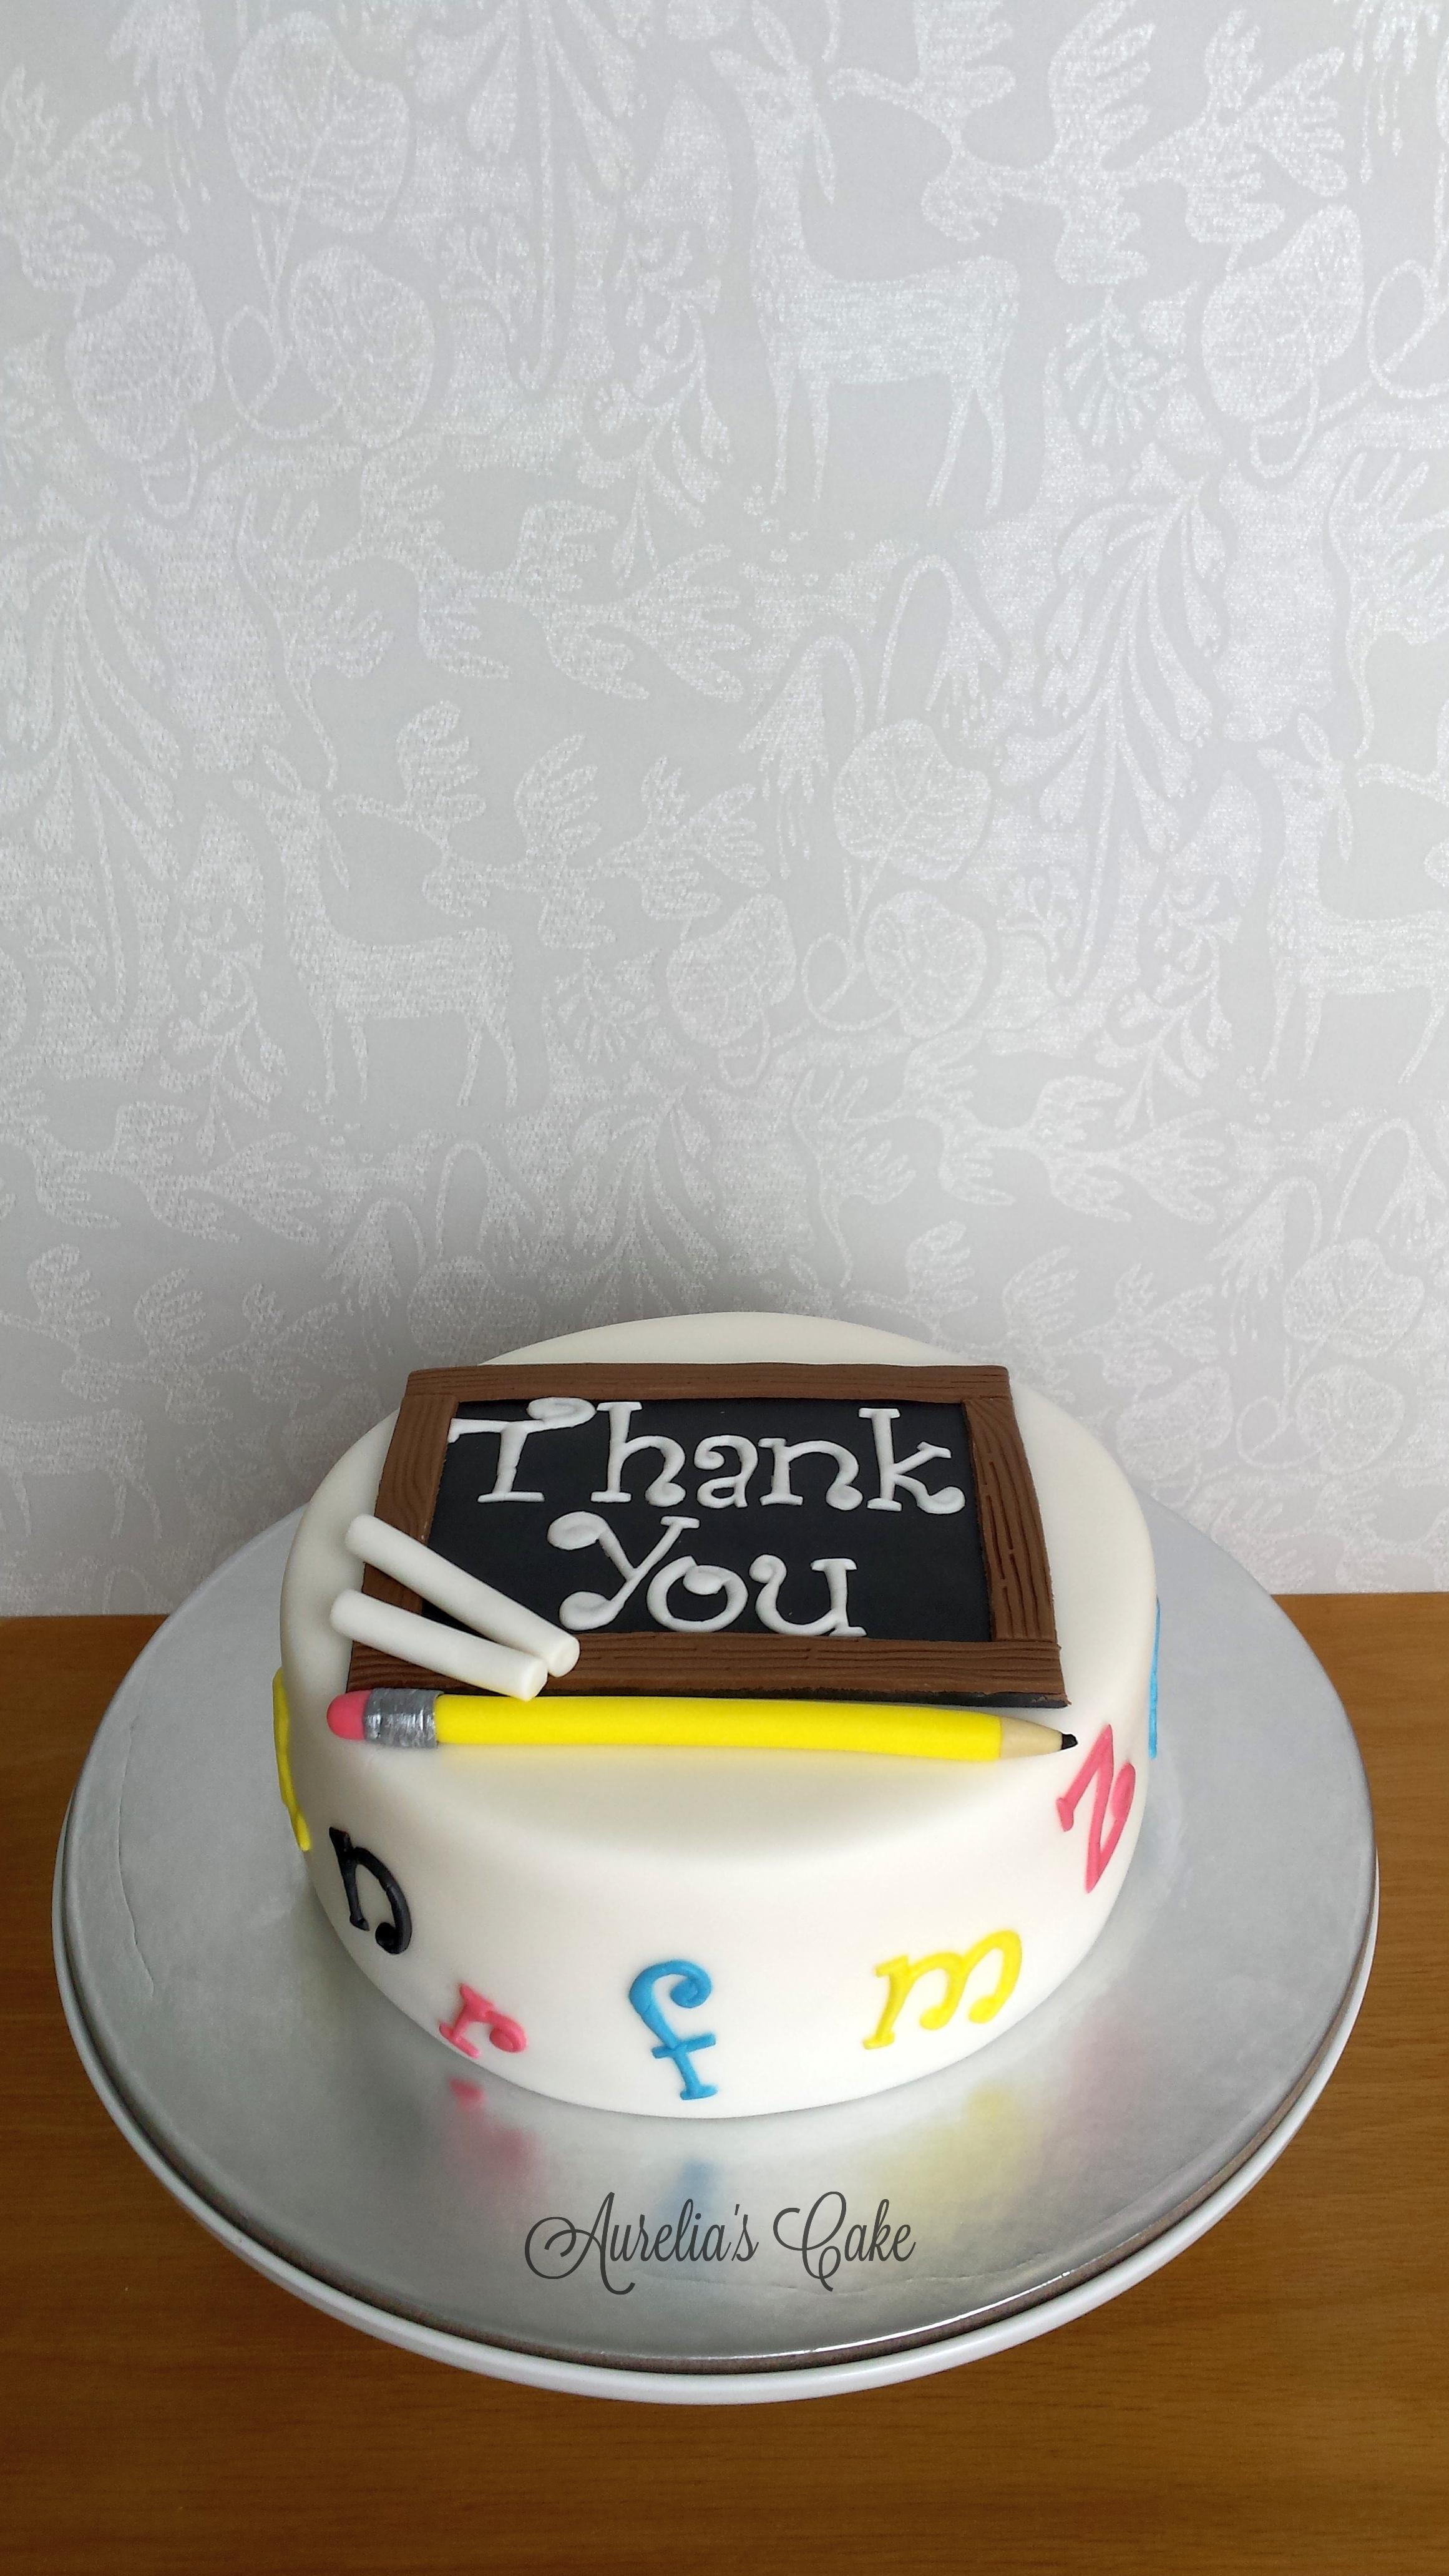 Thank you teacher cake.